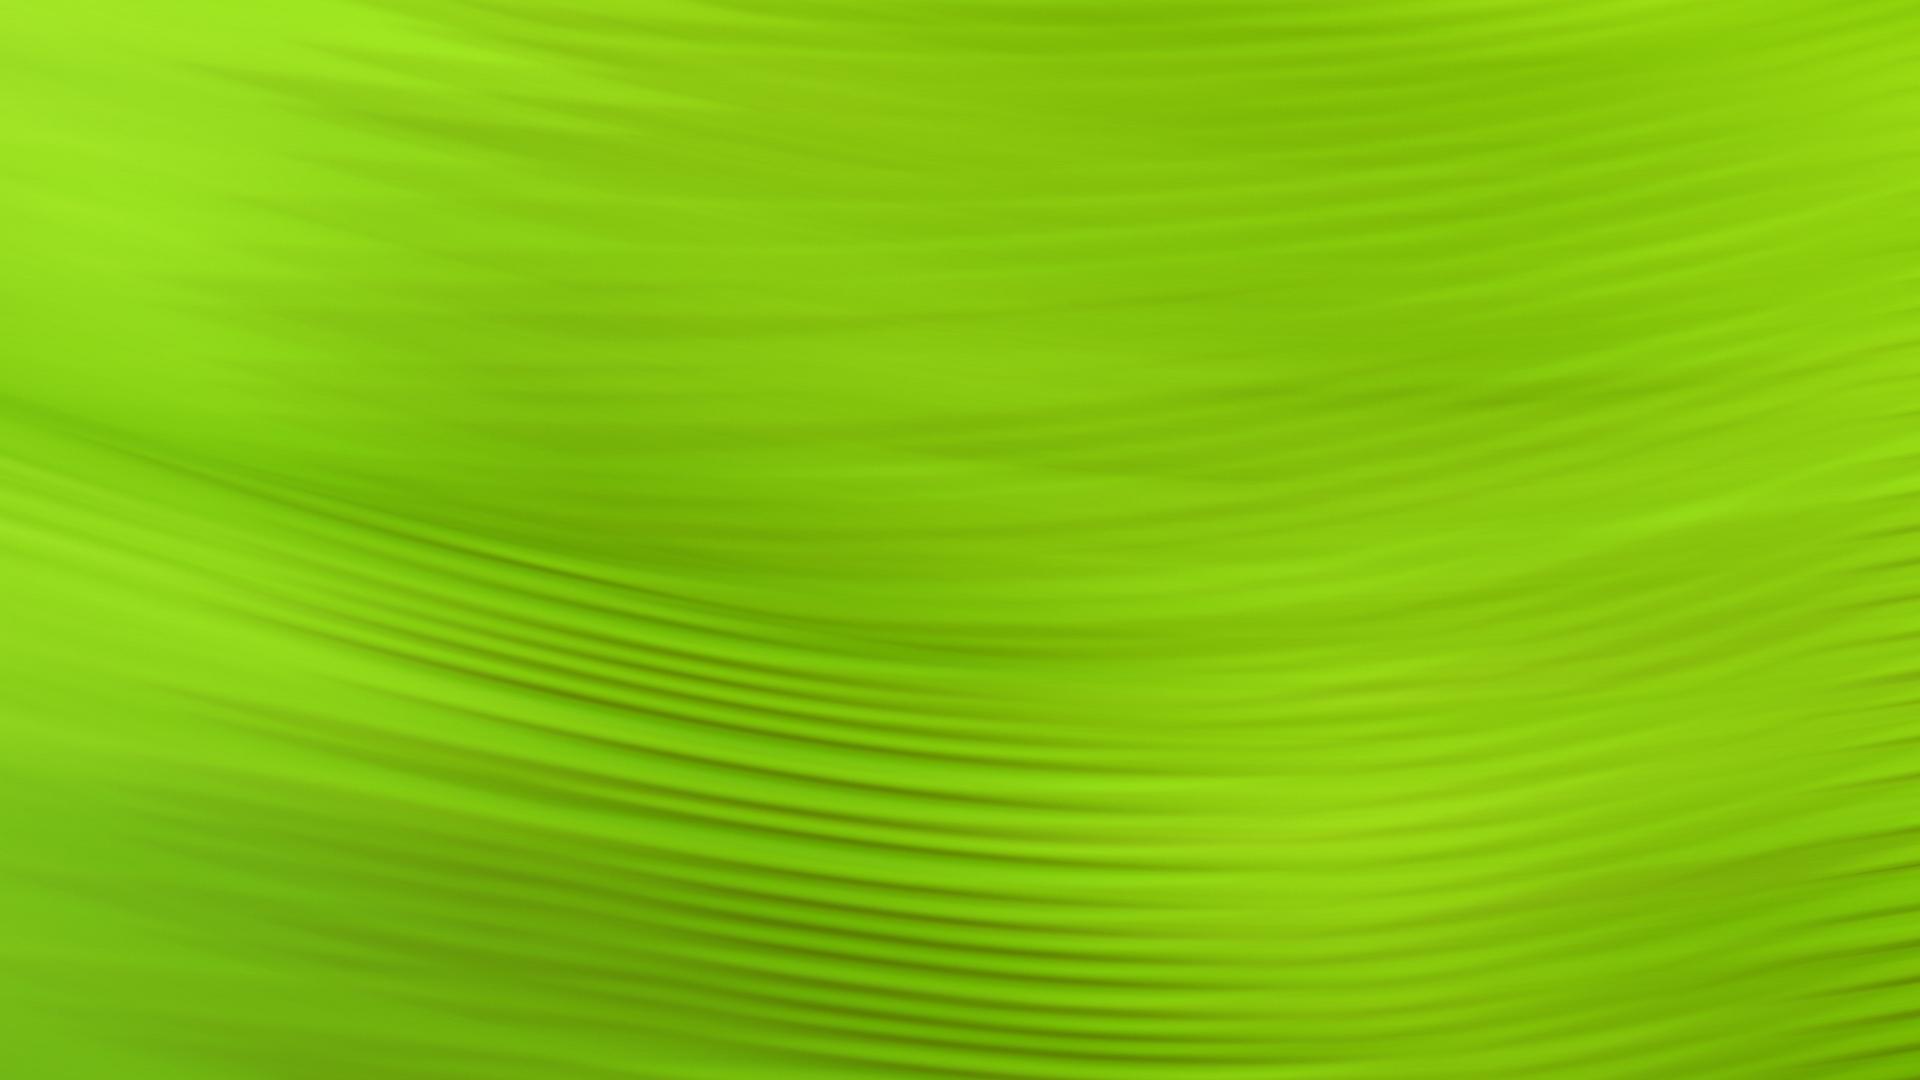 Green Abstract Wallpaper Desktop Backgrou 11459 Hd Wallpapers 1920x1080